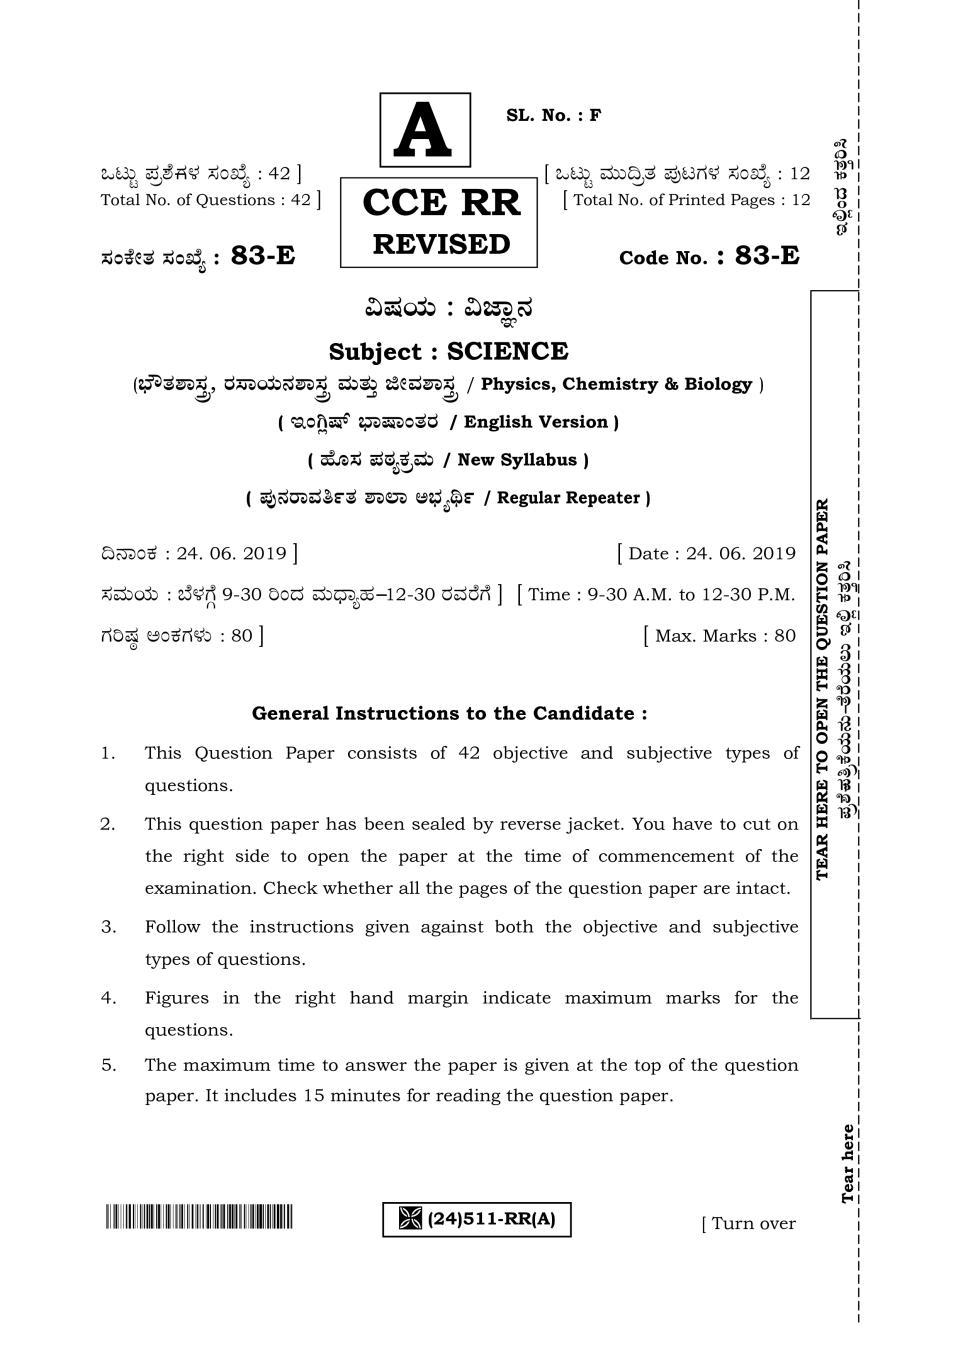 Karnataka SSLC Science Question Paper Jun 2019 - Page 1